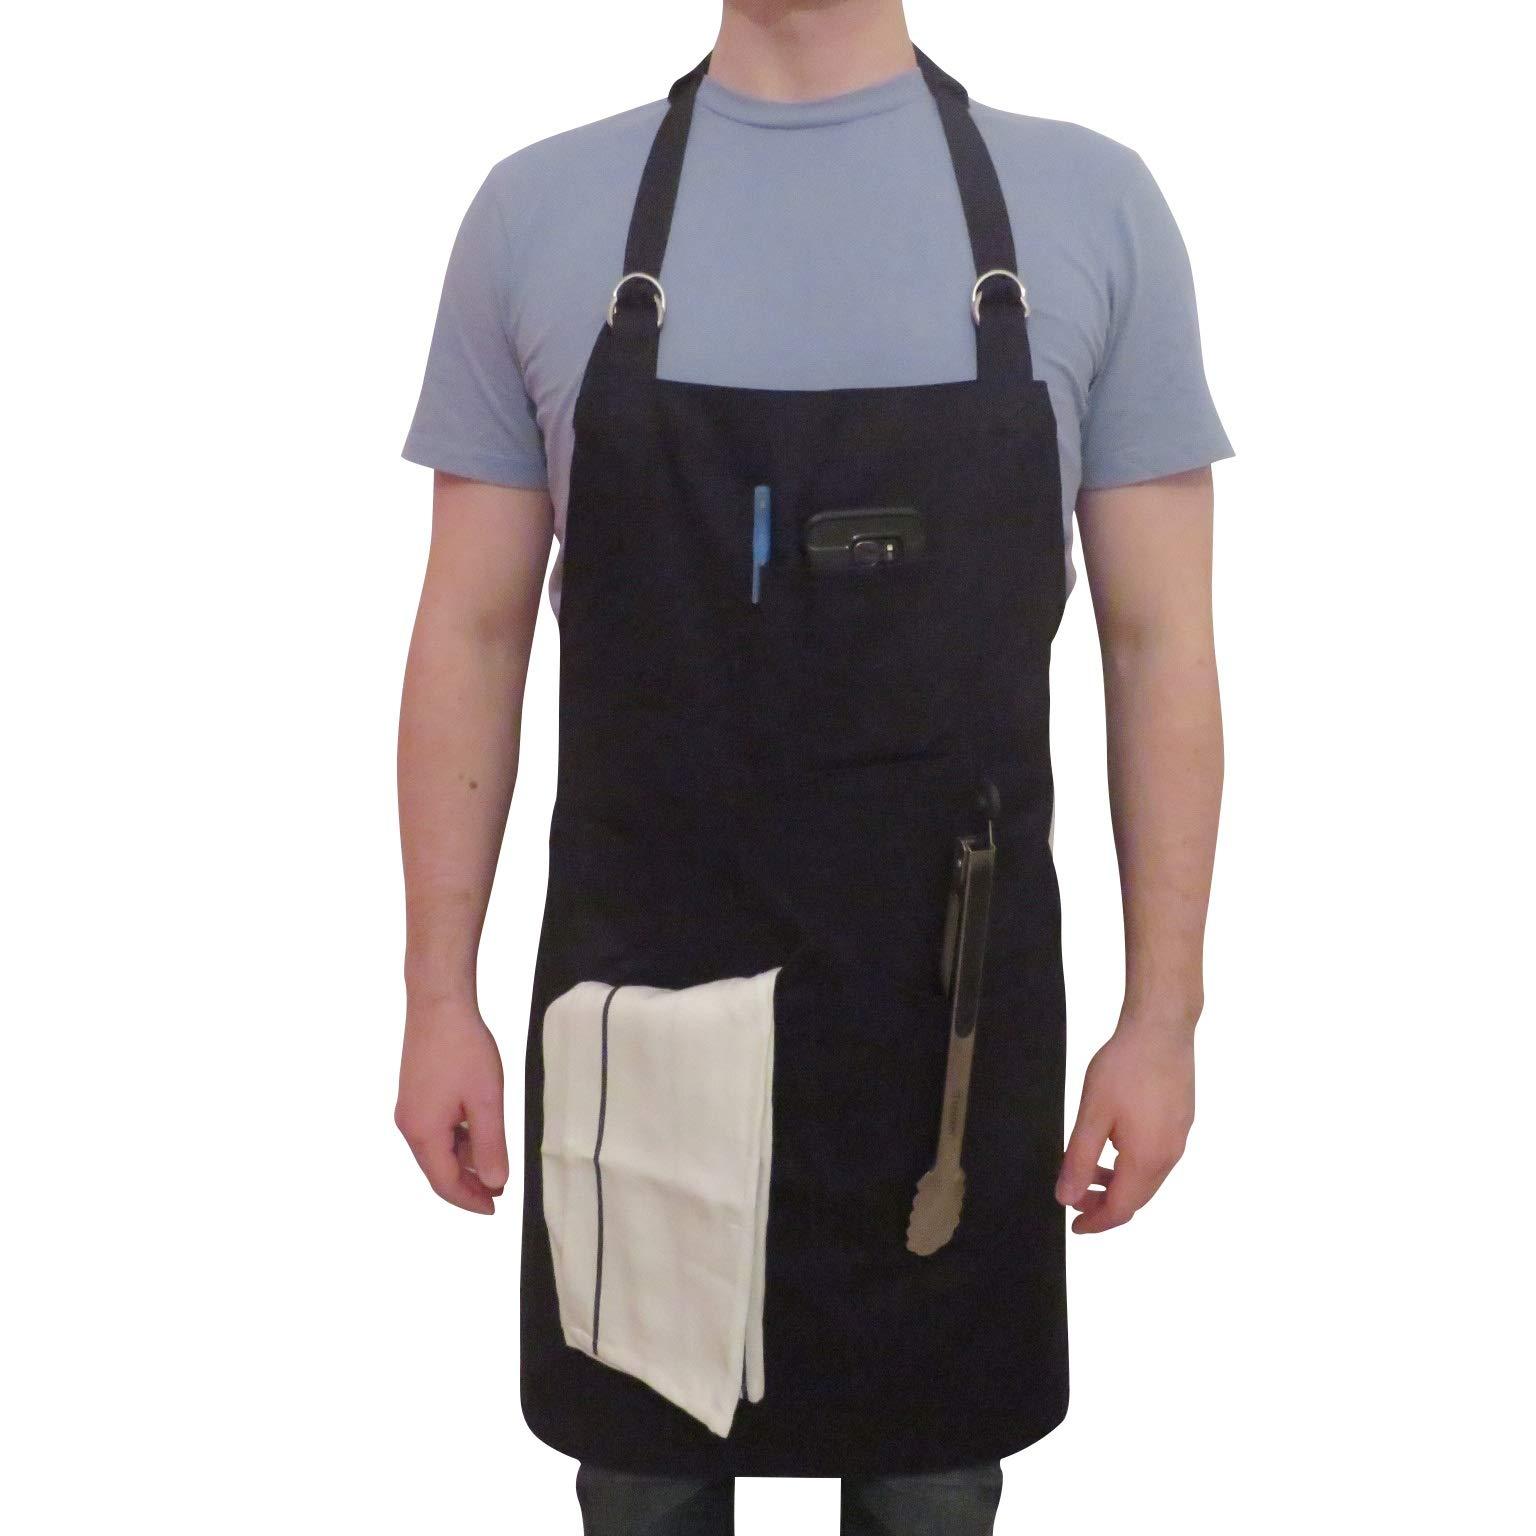 Professional Kitchen Protective Adjustable Suitable